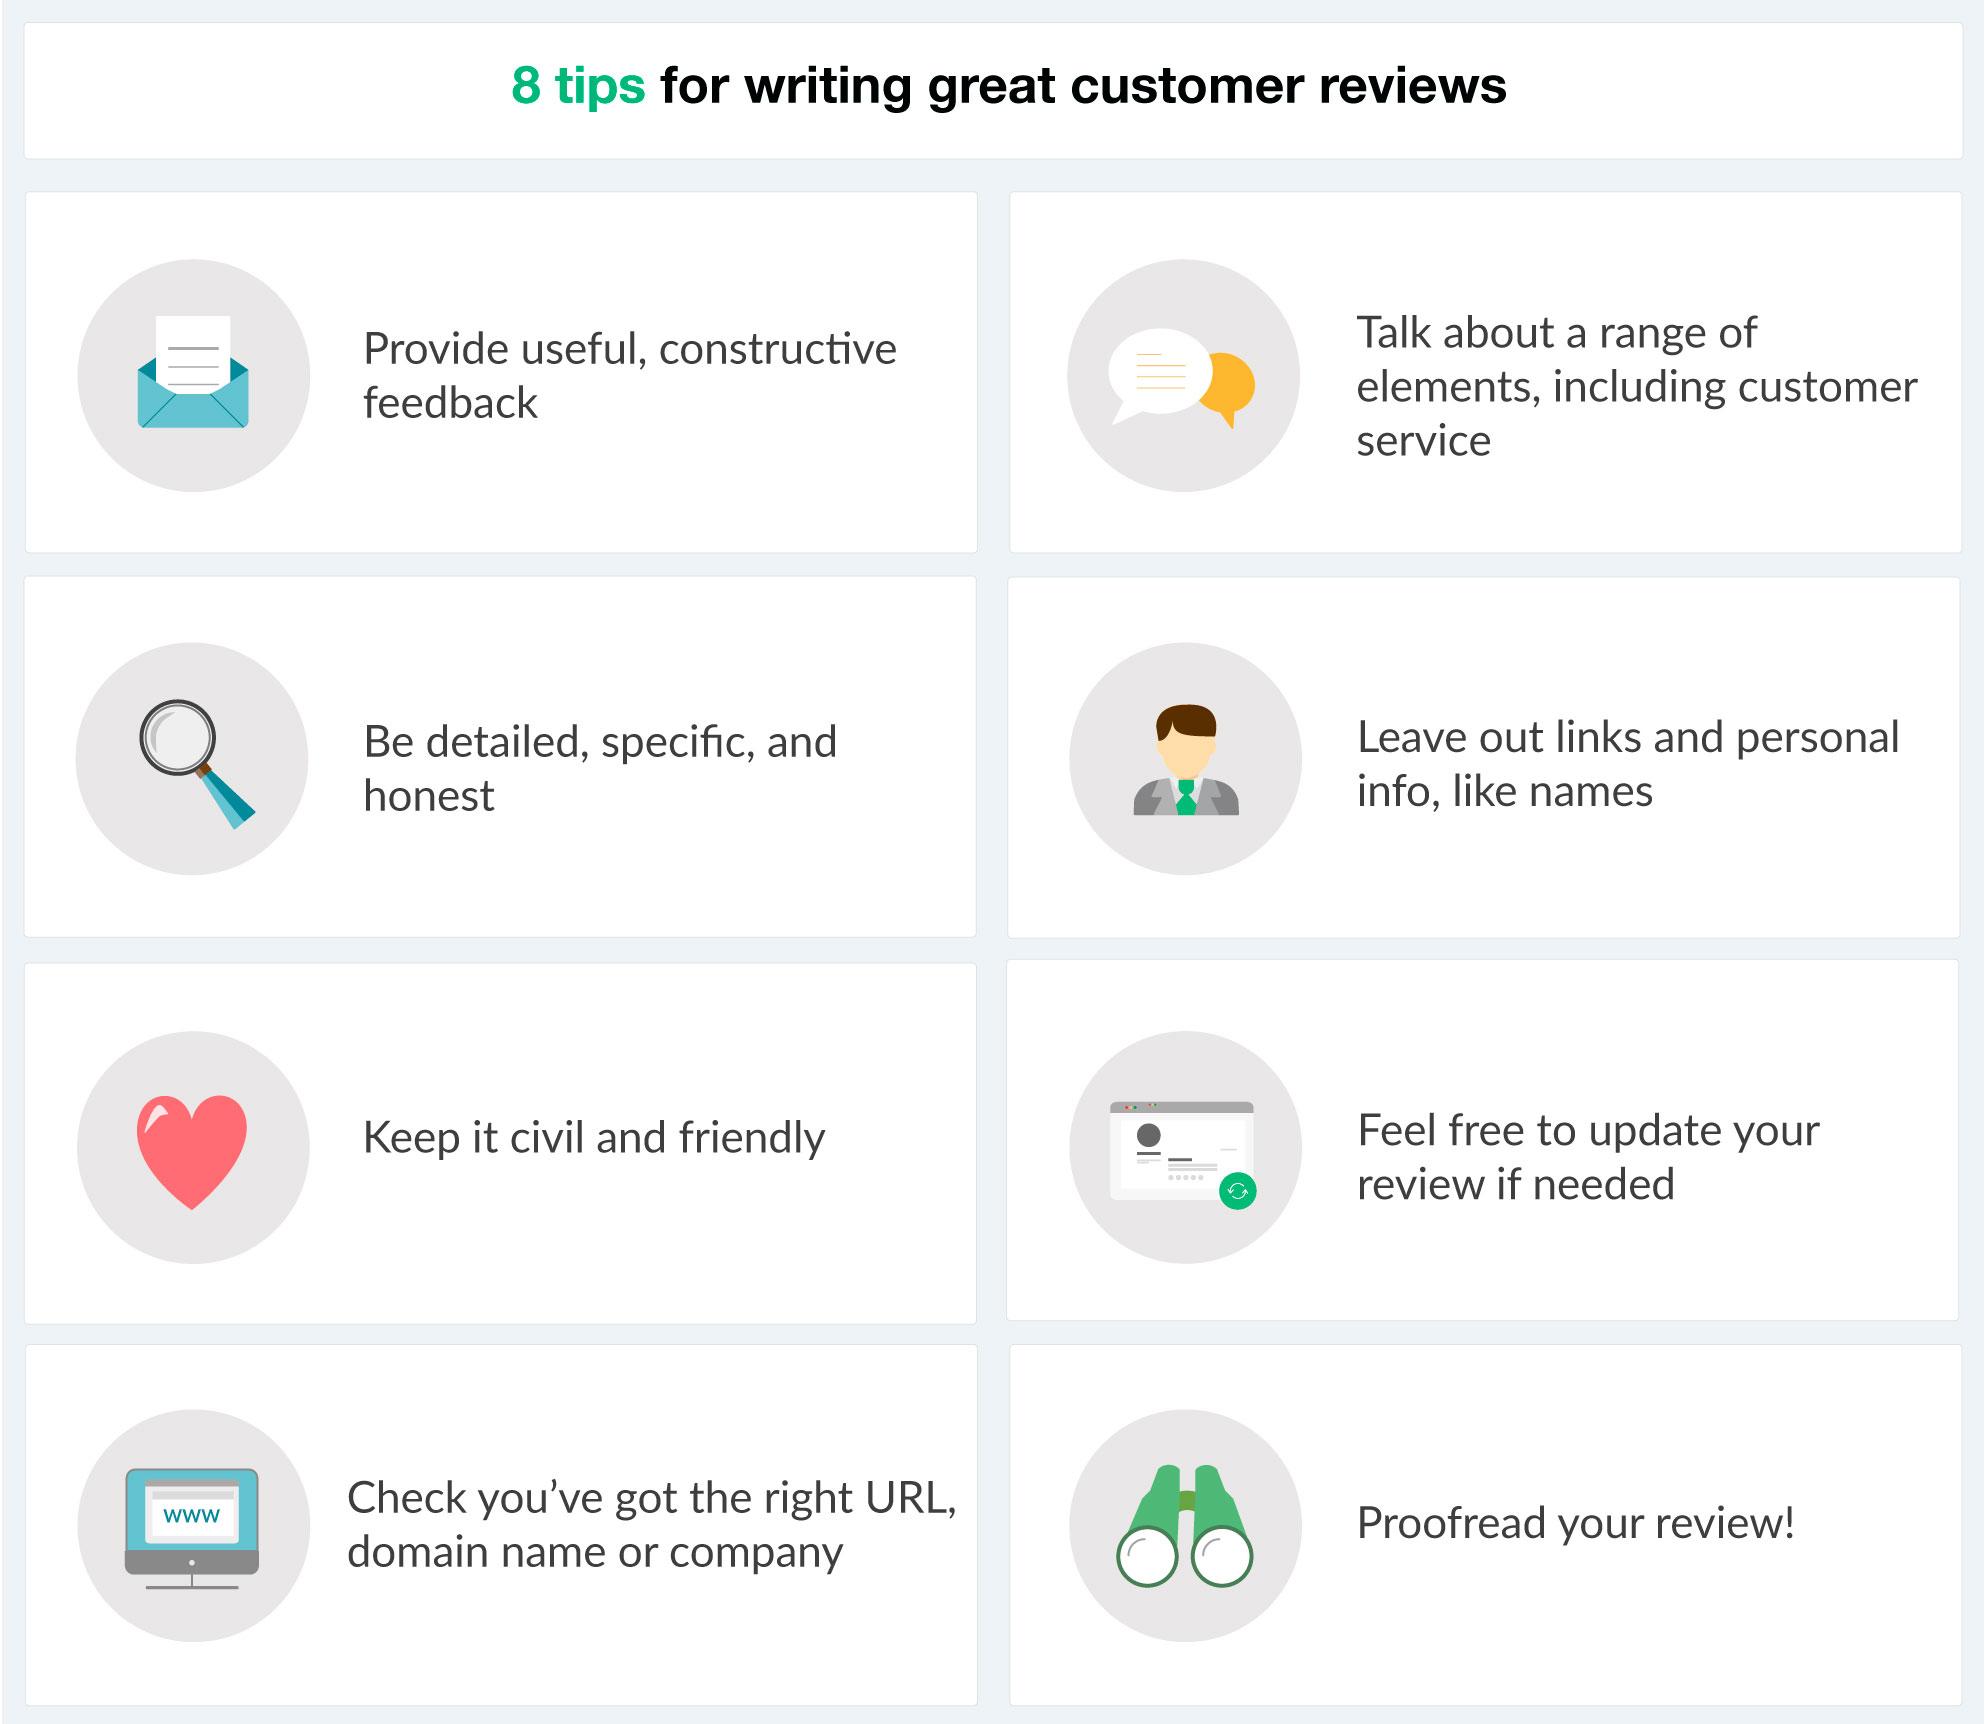 8_tips_for_leaving_great_customer_reviews-ENG-1.jpg